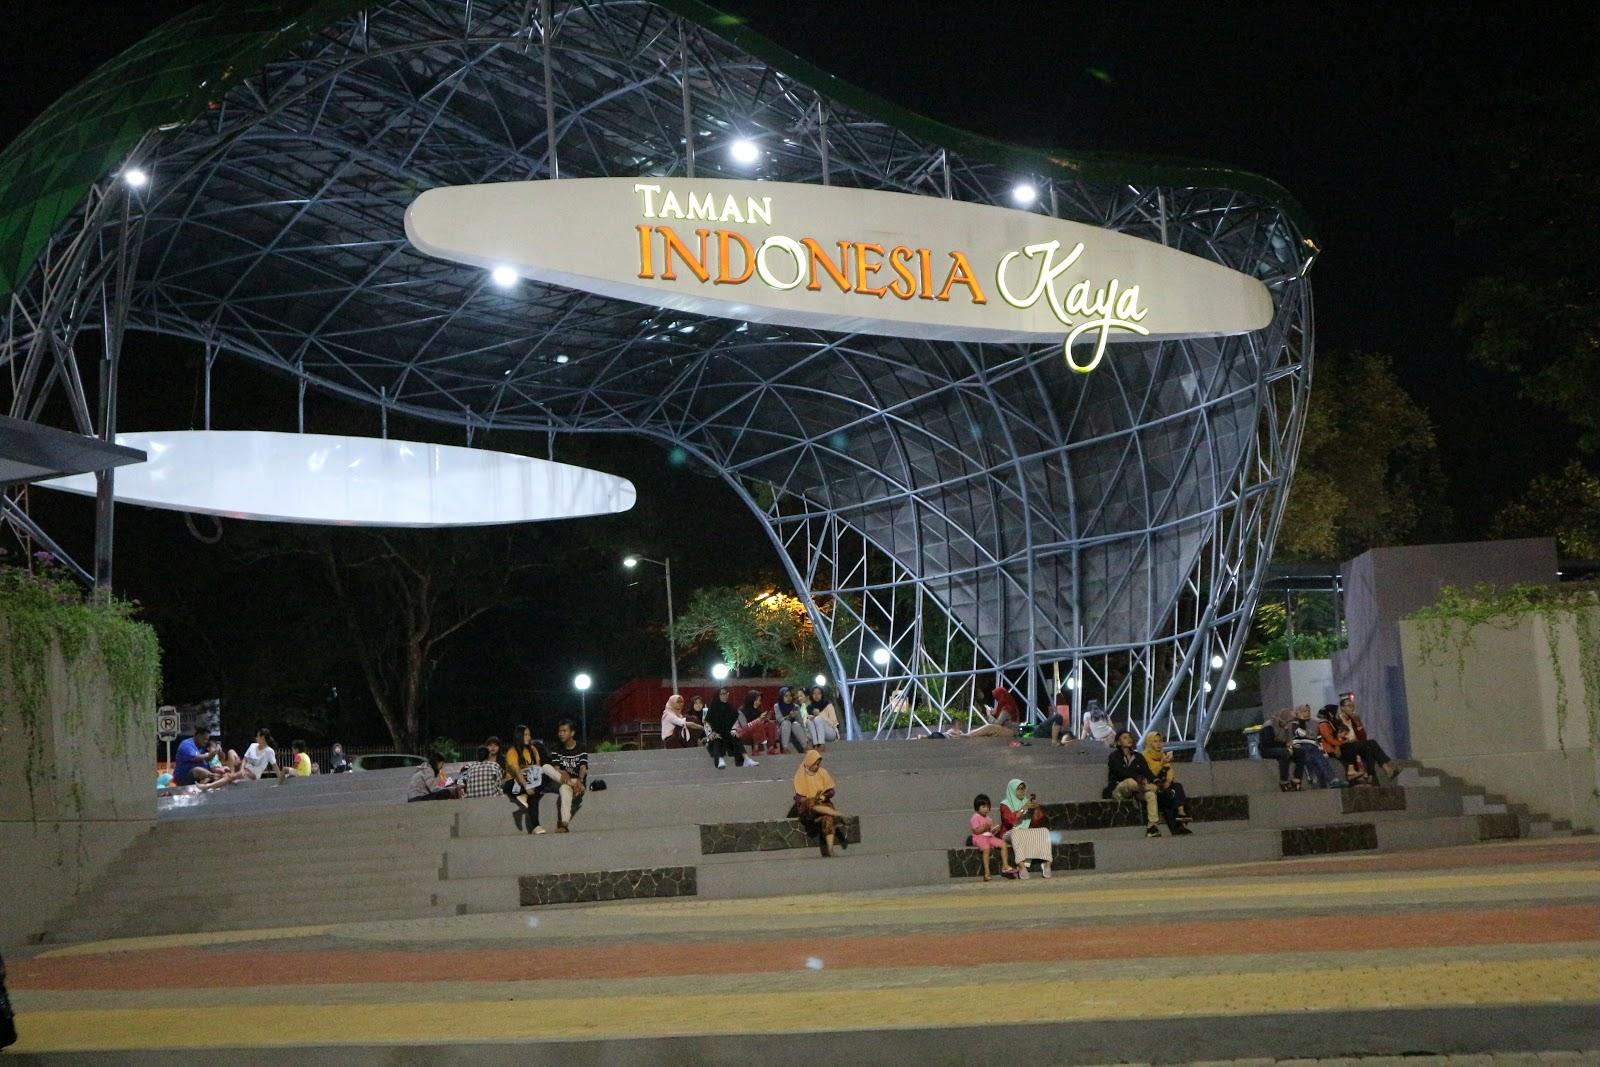 Indonesia Kaya Park